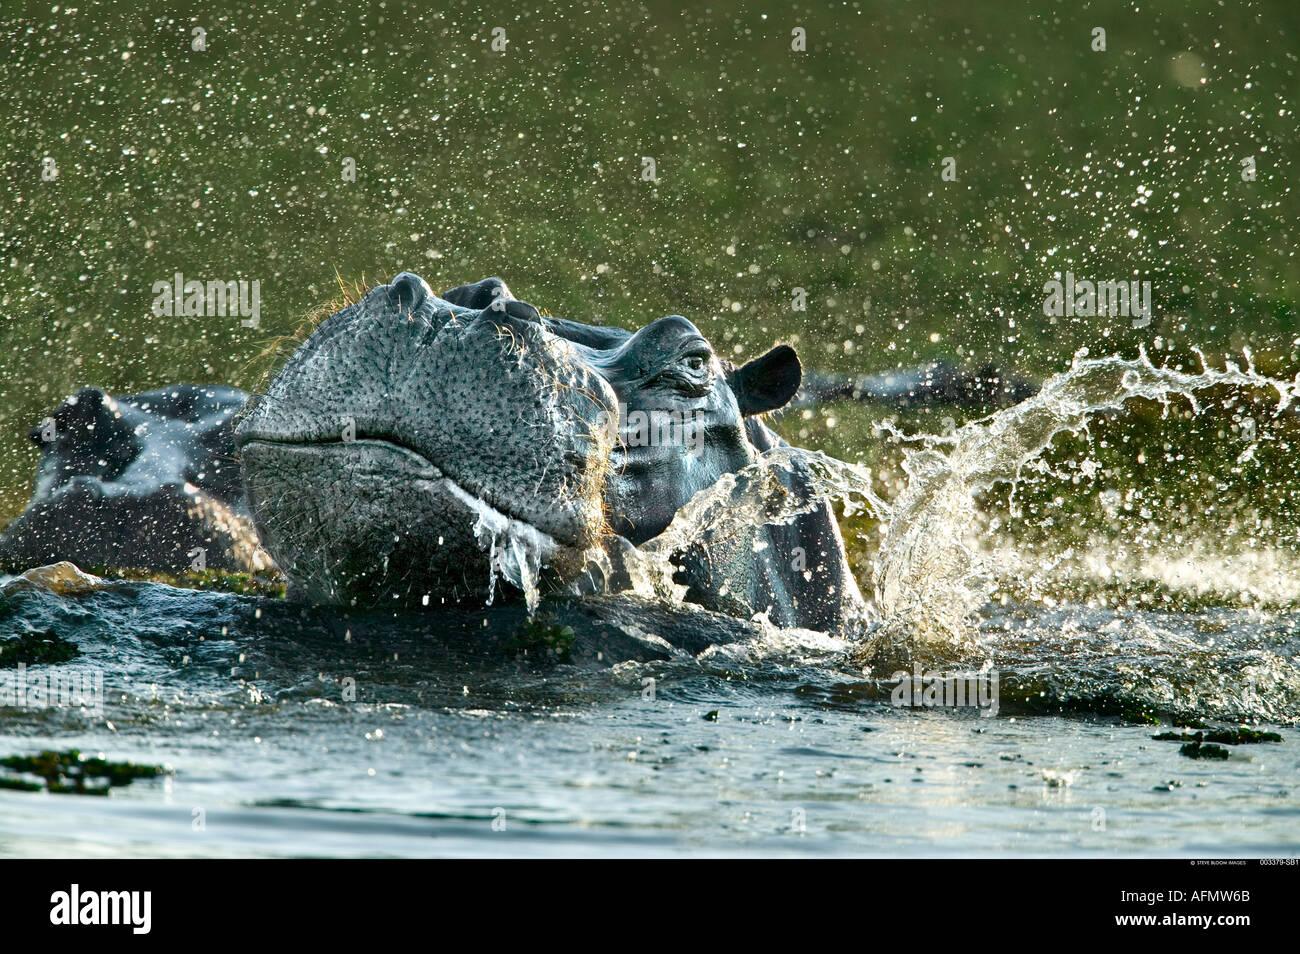 Hippopotamus Okavango Delta Botswana - Stock Image